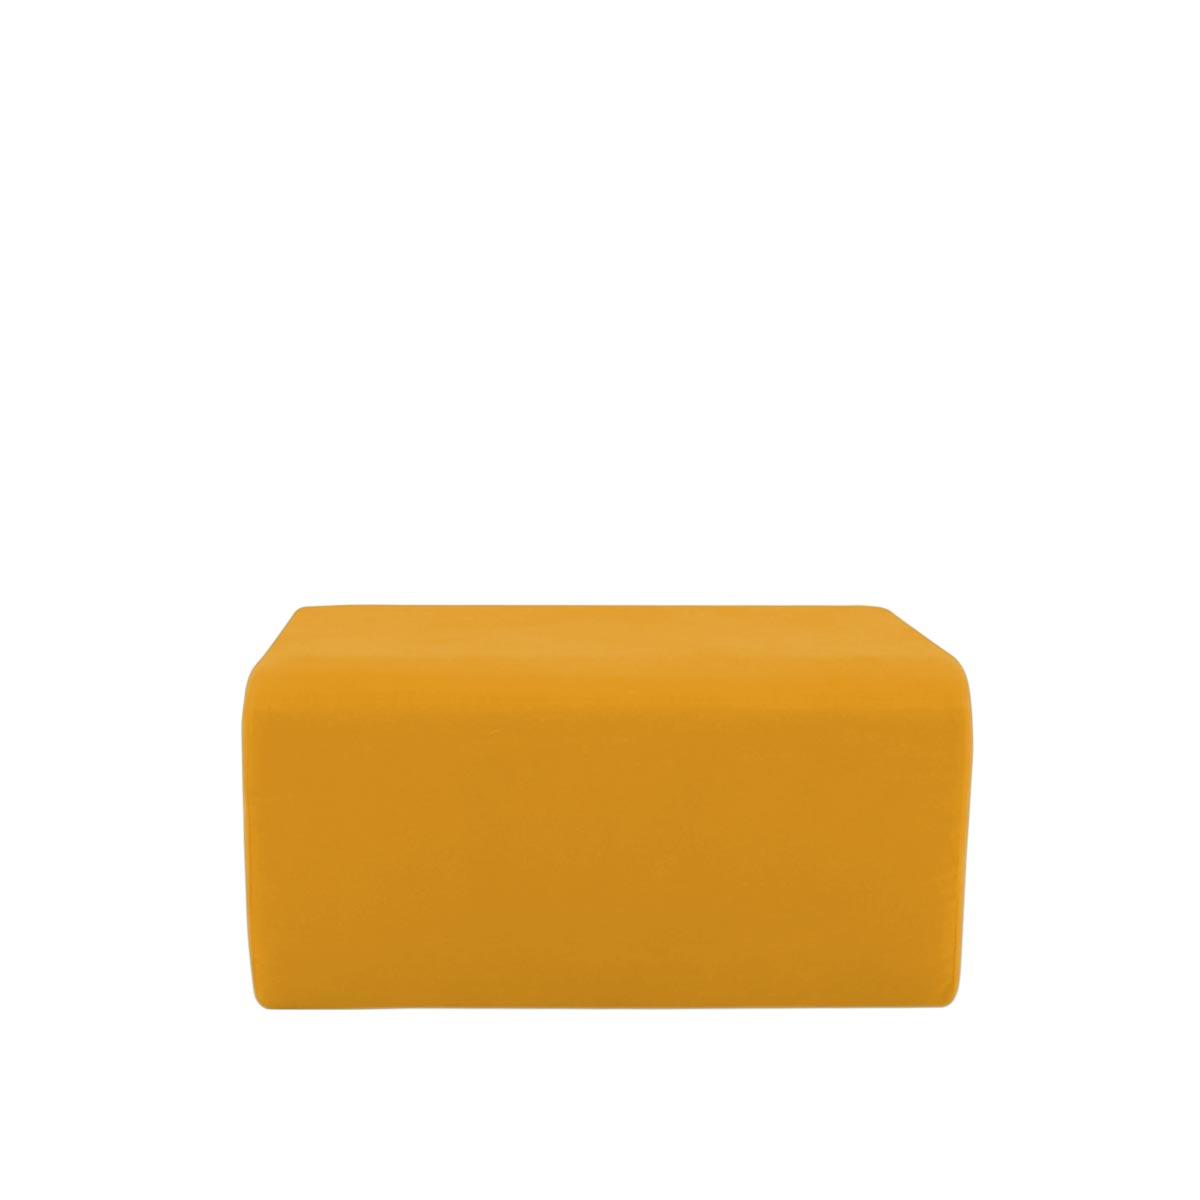 Pufe Muss R02 Tecido Lonita Ouro 01